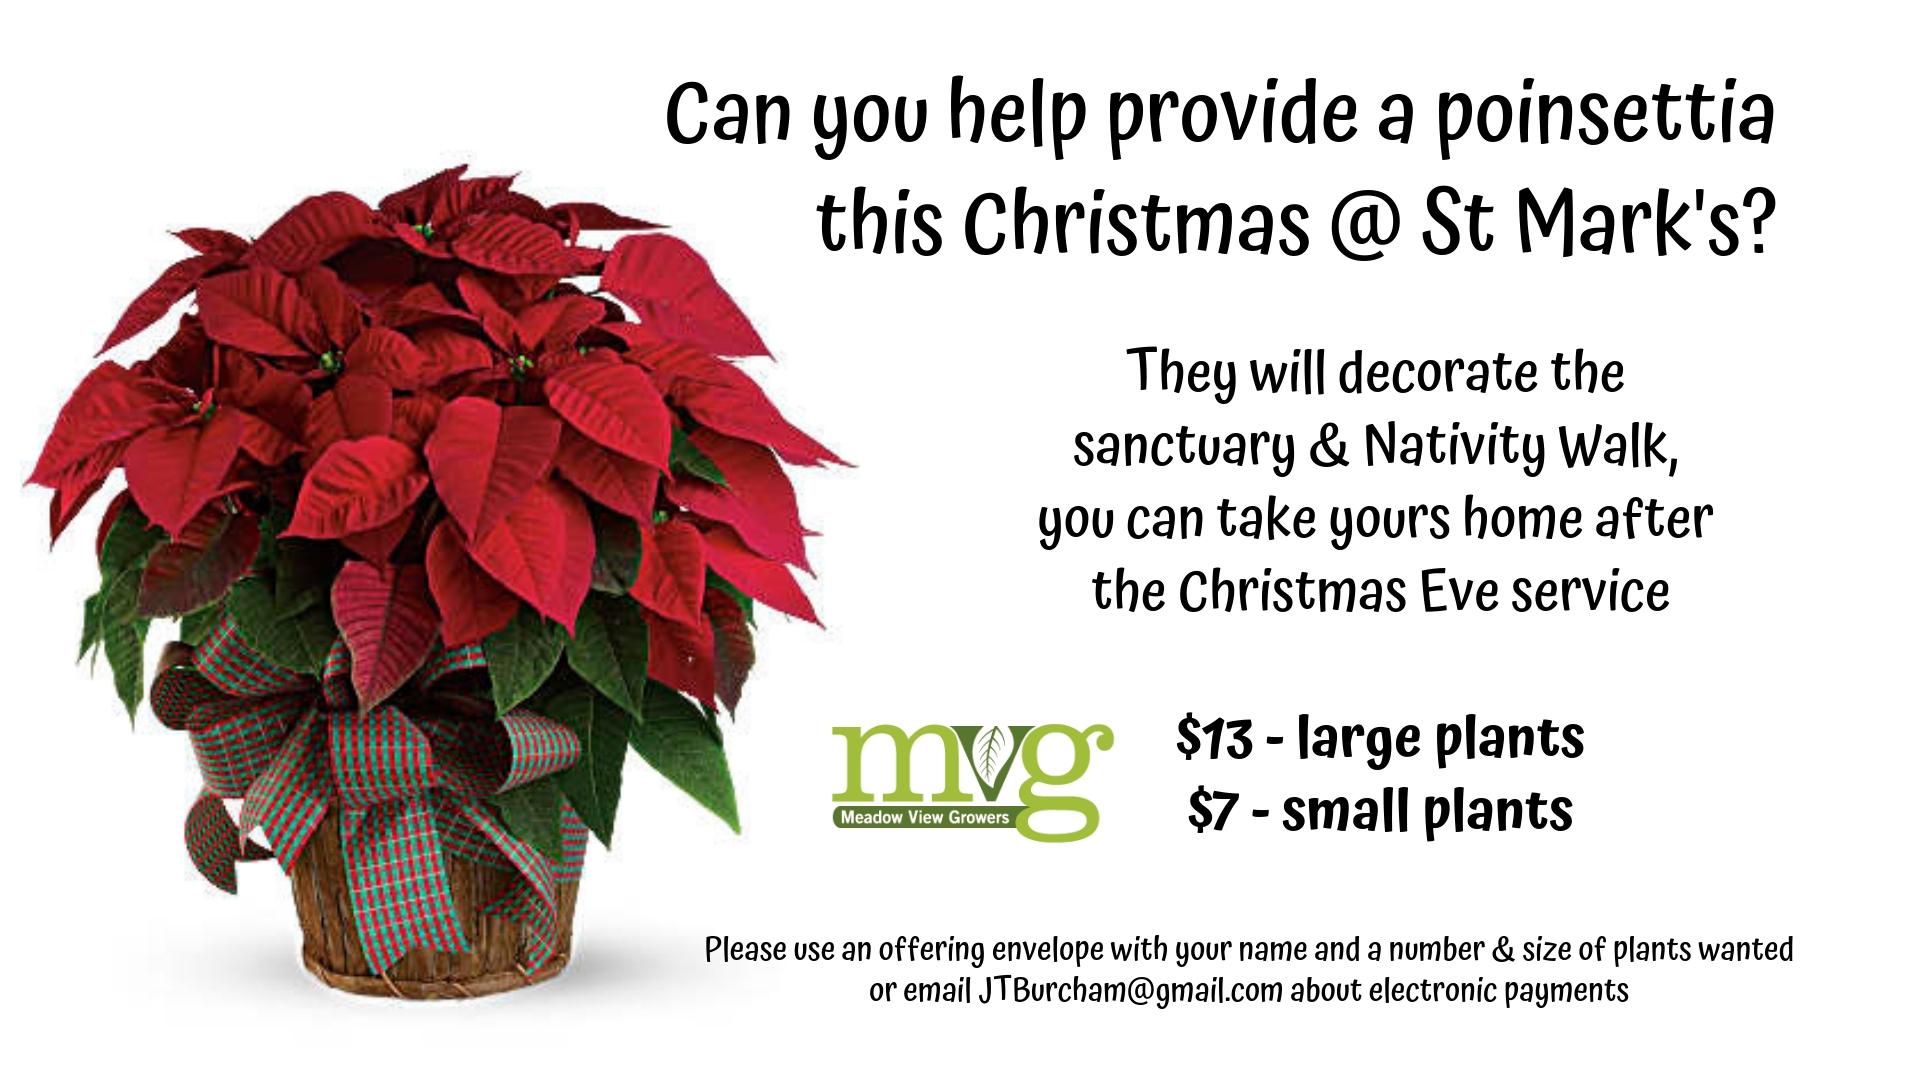 181209-Poinsettias @ St Mark's this Christmas .jpg